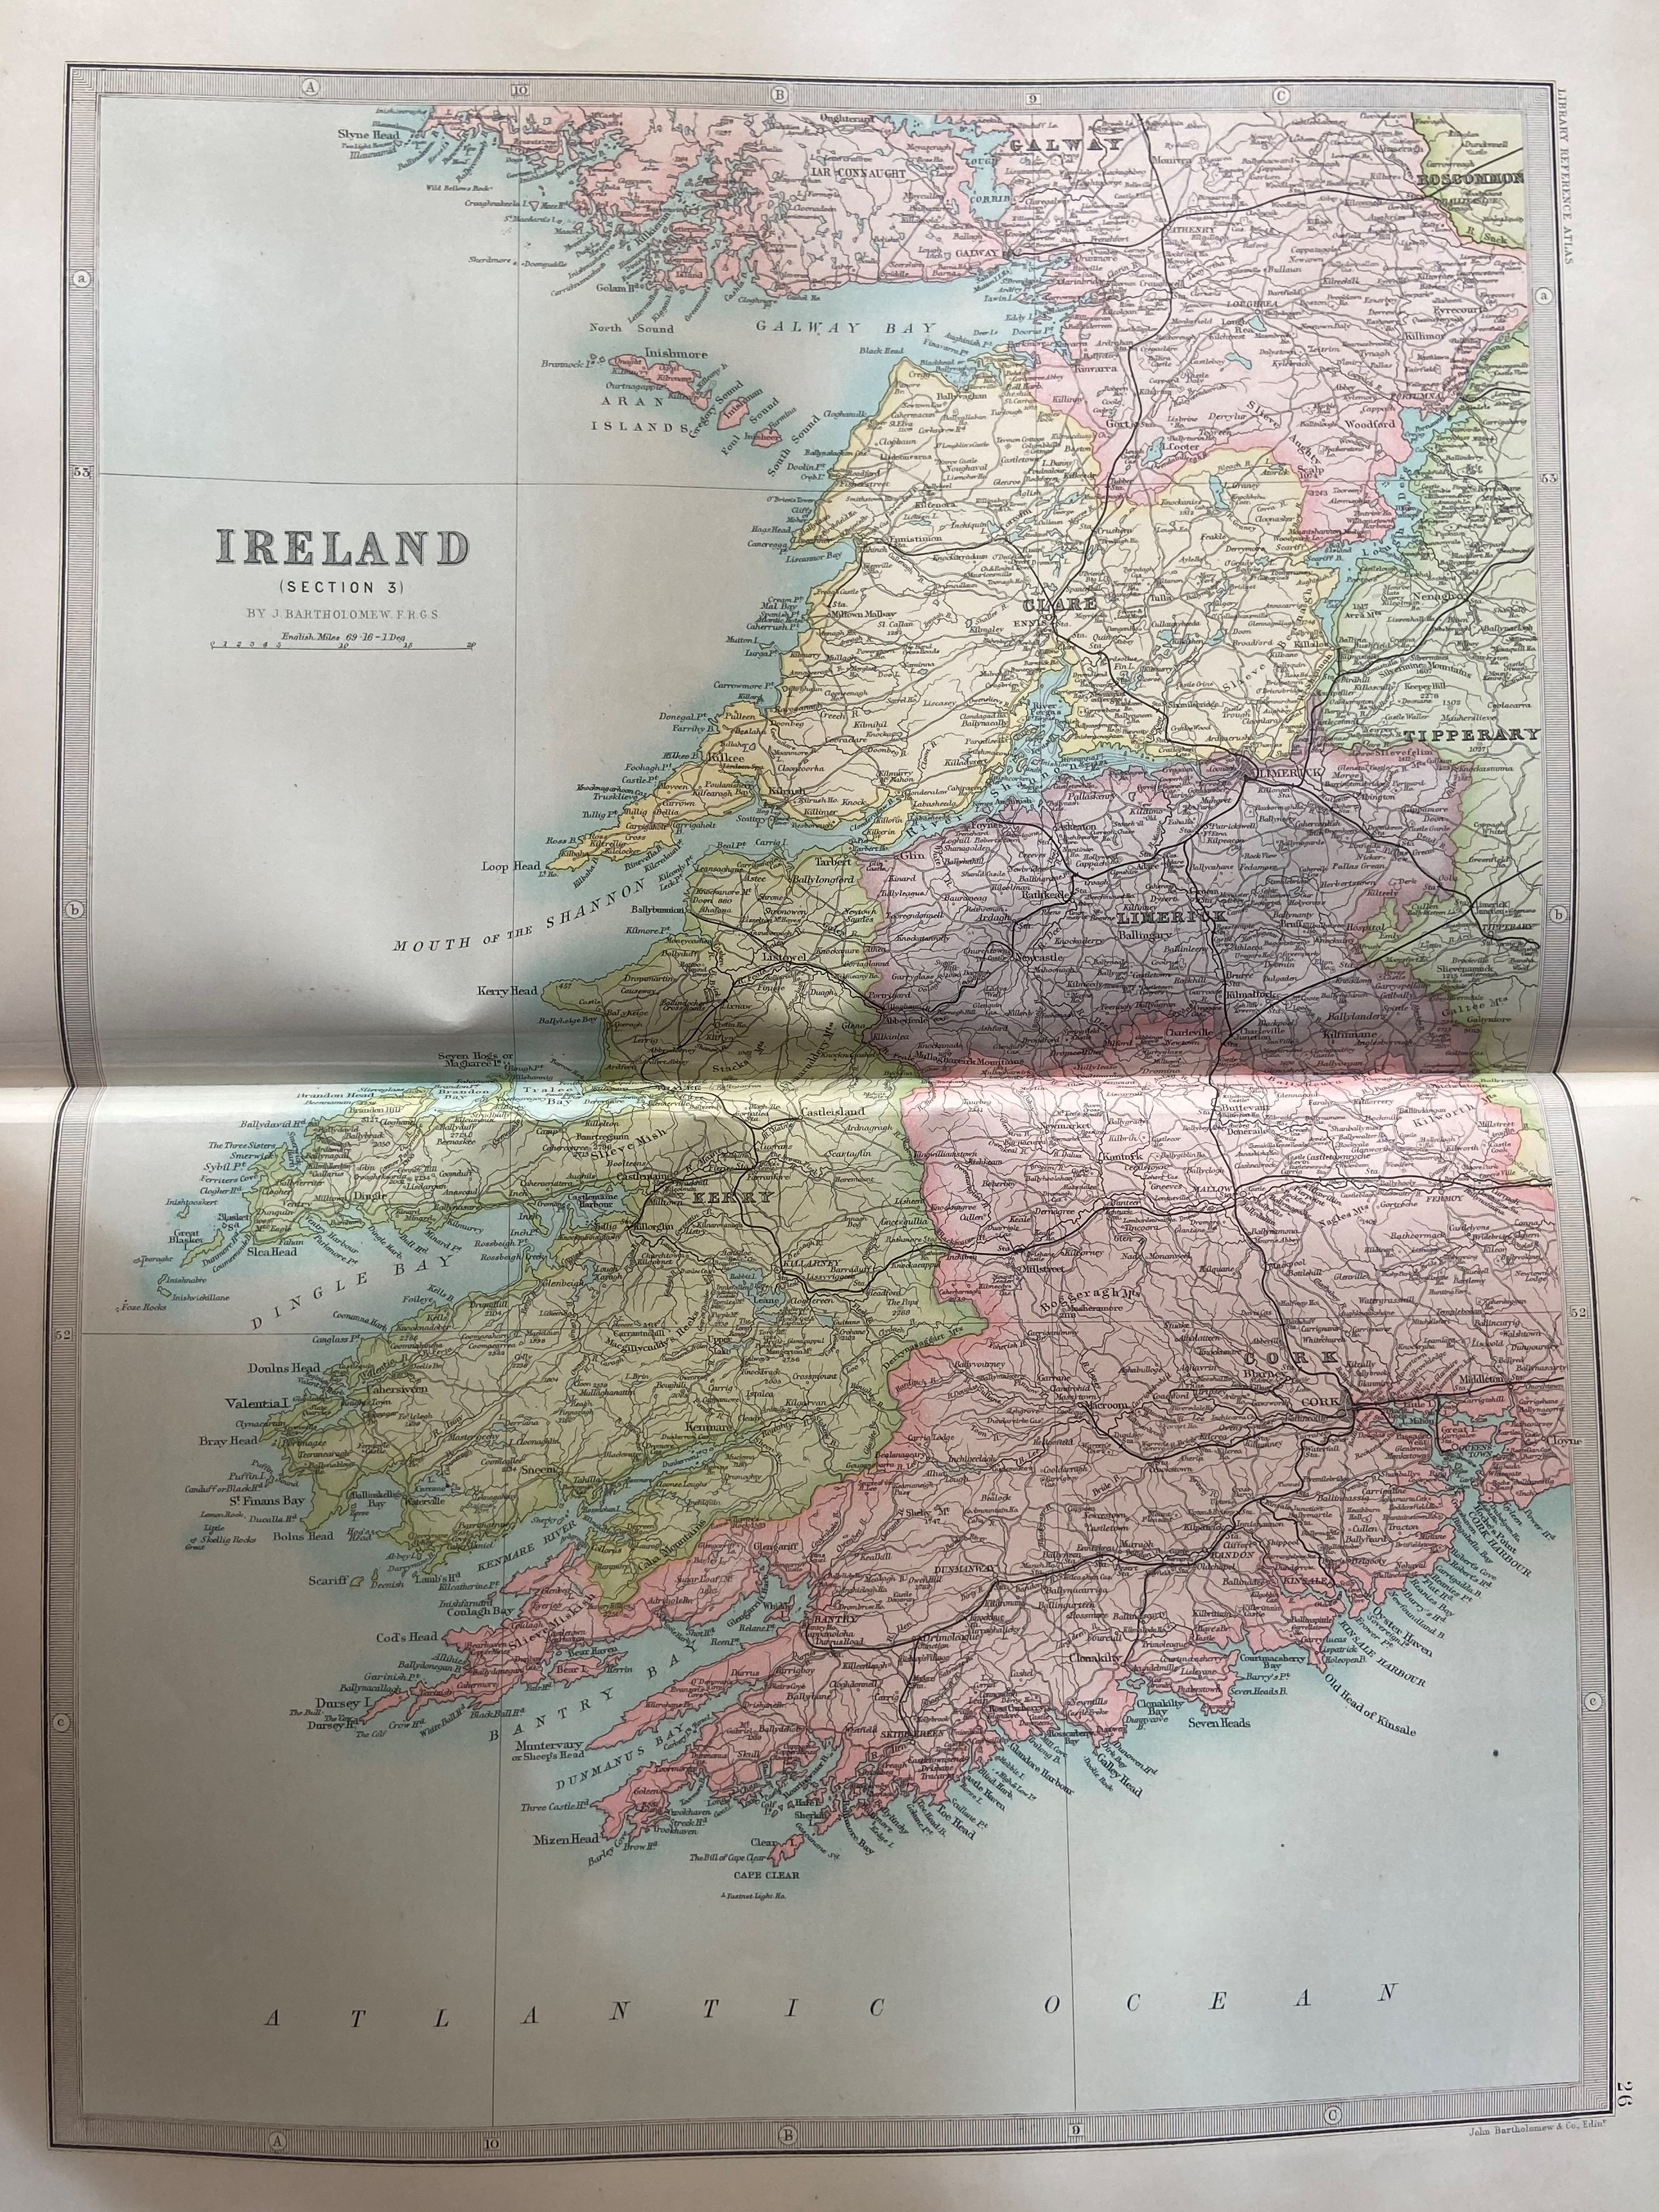 Atlas: Bartholomew (John)The Library Atlas of theWorld, V. lg. folio L. (Macmillan & Co.) 1890. - Image 2 of 2